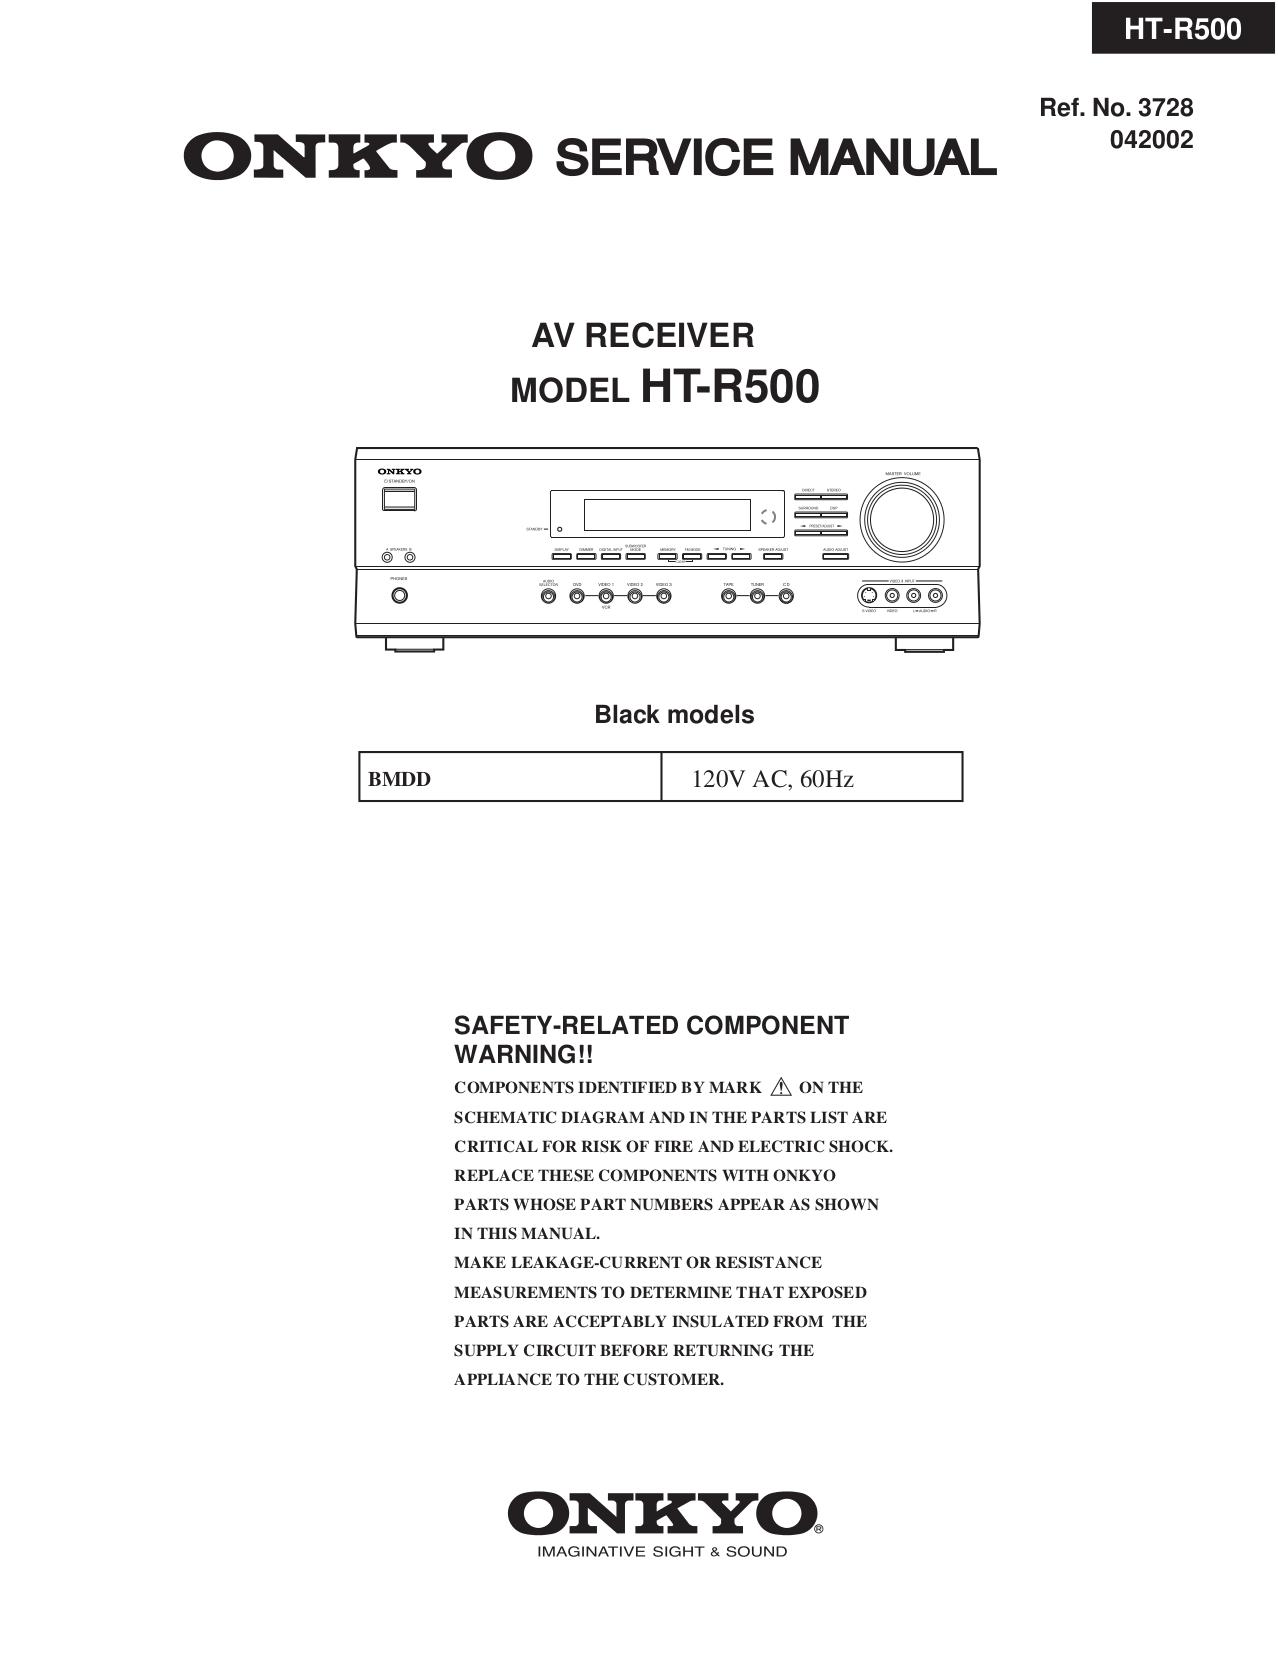 download free pdf for onkyo ht r500 receiver manual rh umlib com Onkyo HT R500 Remote onkyo ht-r500 service manual